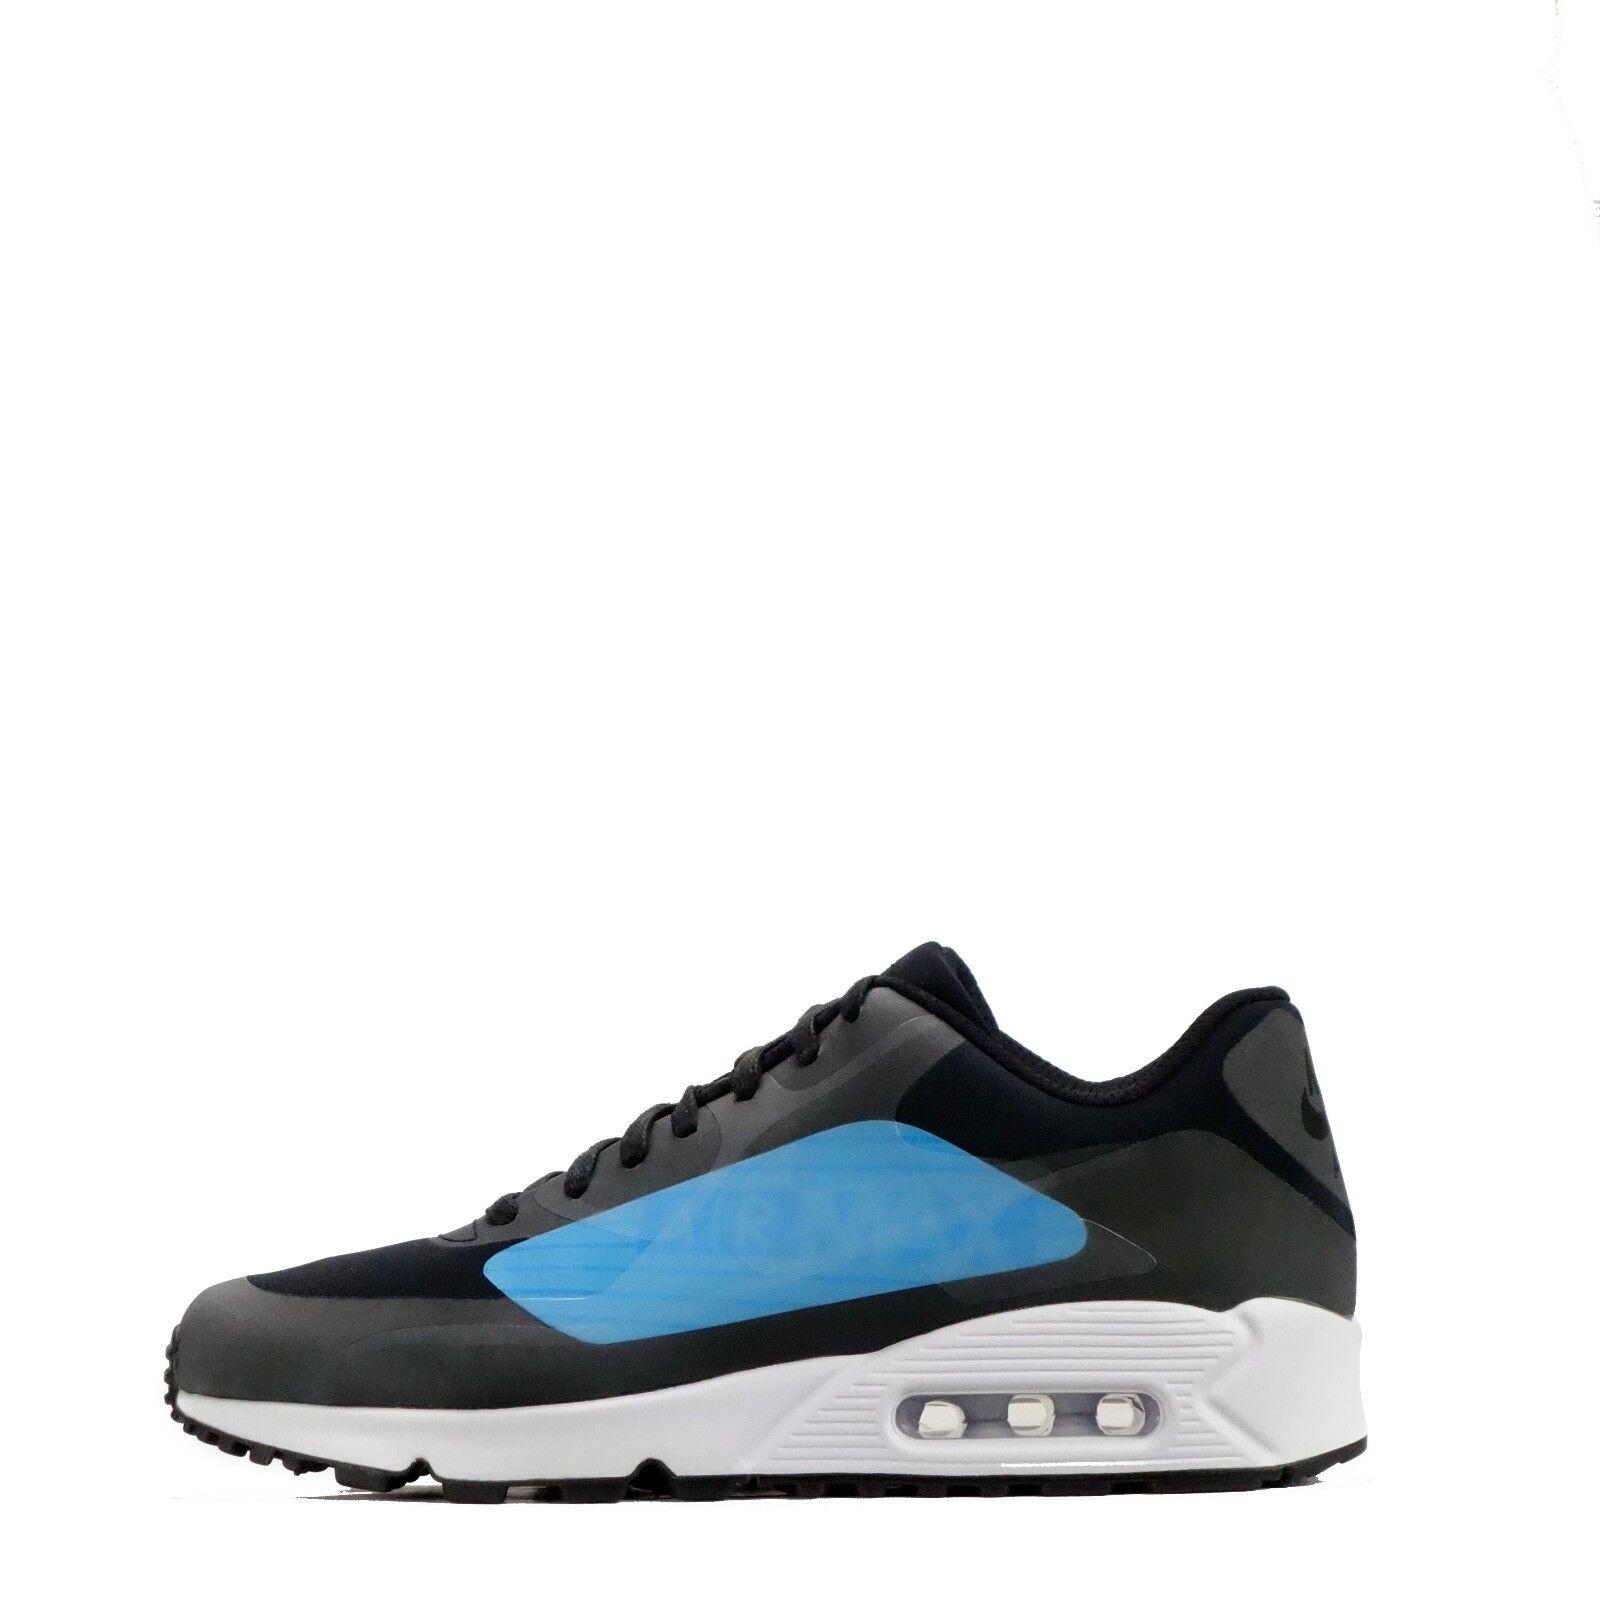 Nike AIR MAX 90 ns GPX Big Logo Uomo Casual   Da Ginnastica Nero/Blu rrp .99